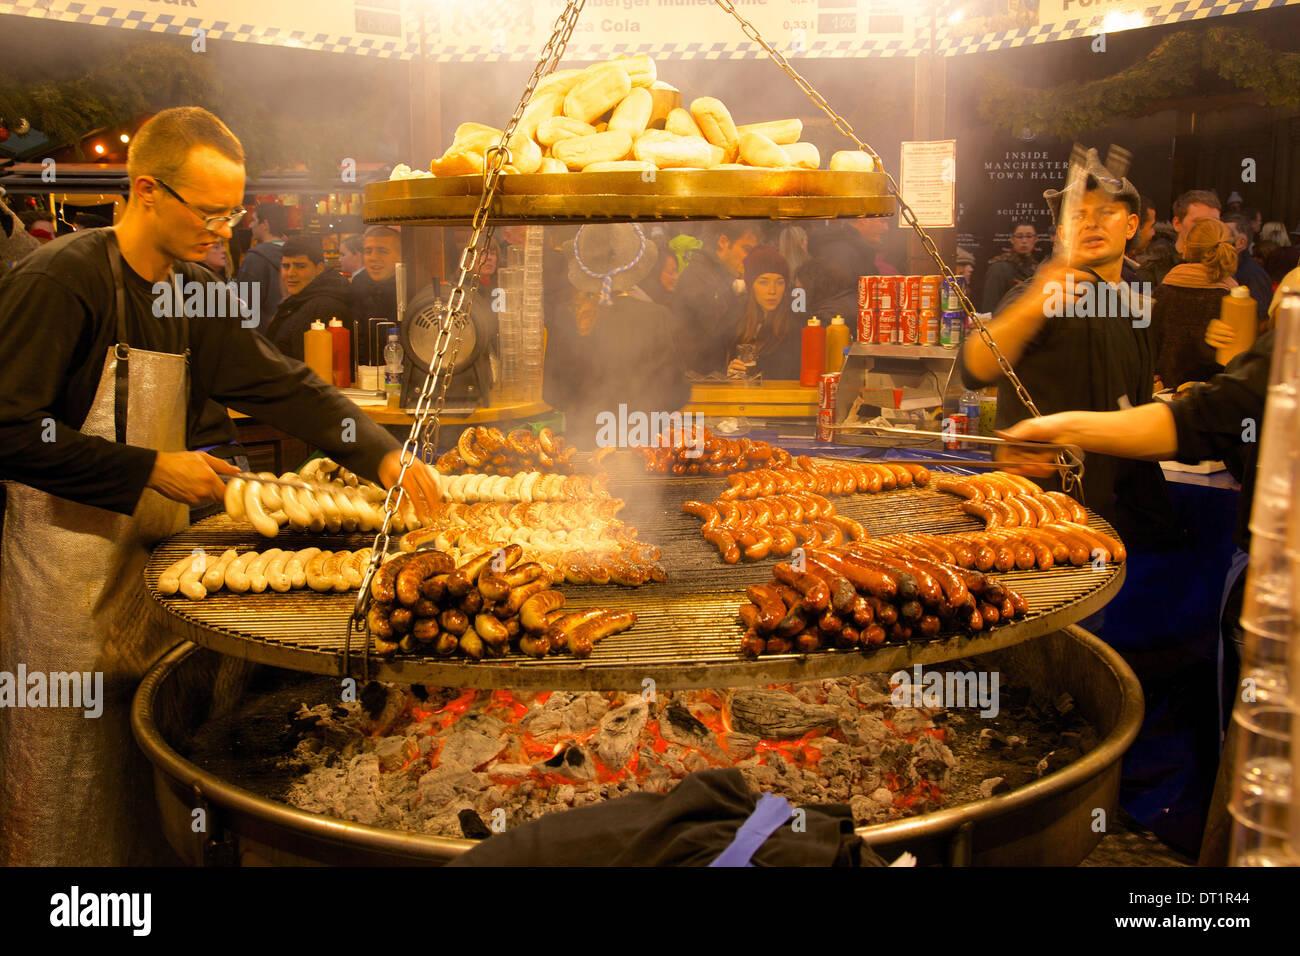 Hot dog stand, Christmas Market, Albert Square, Manchester, England, United Kingdom, Europe Stock Photo